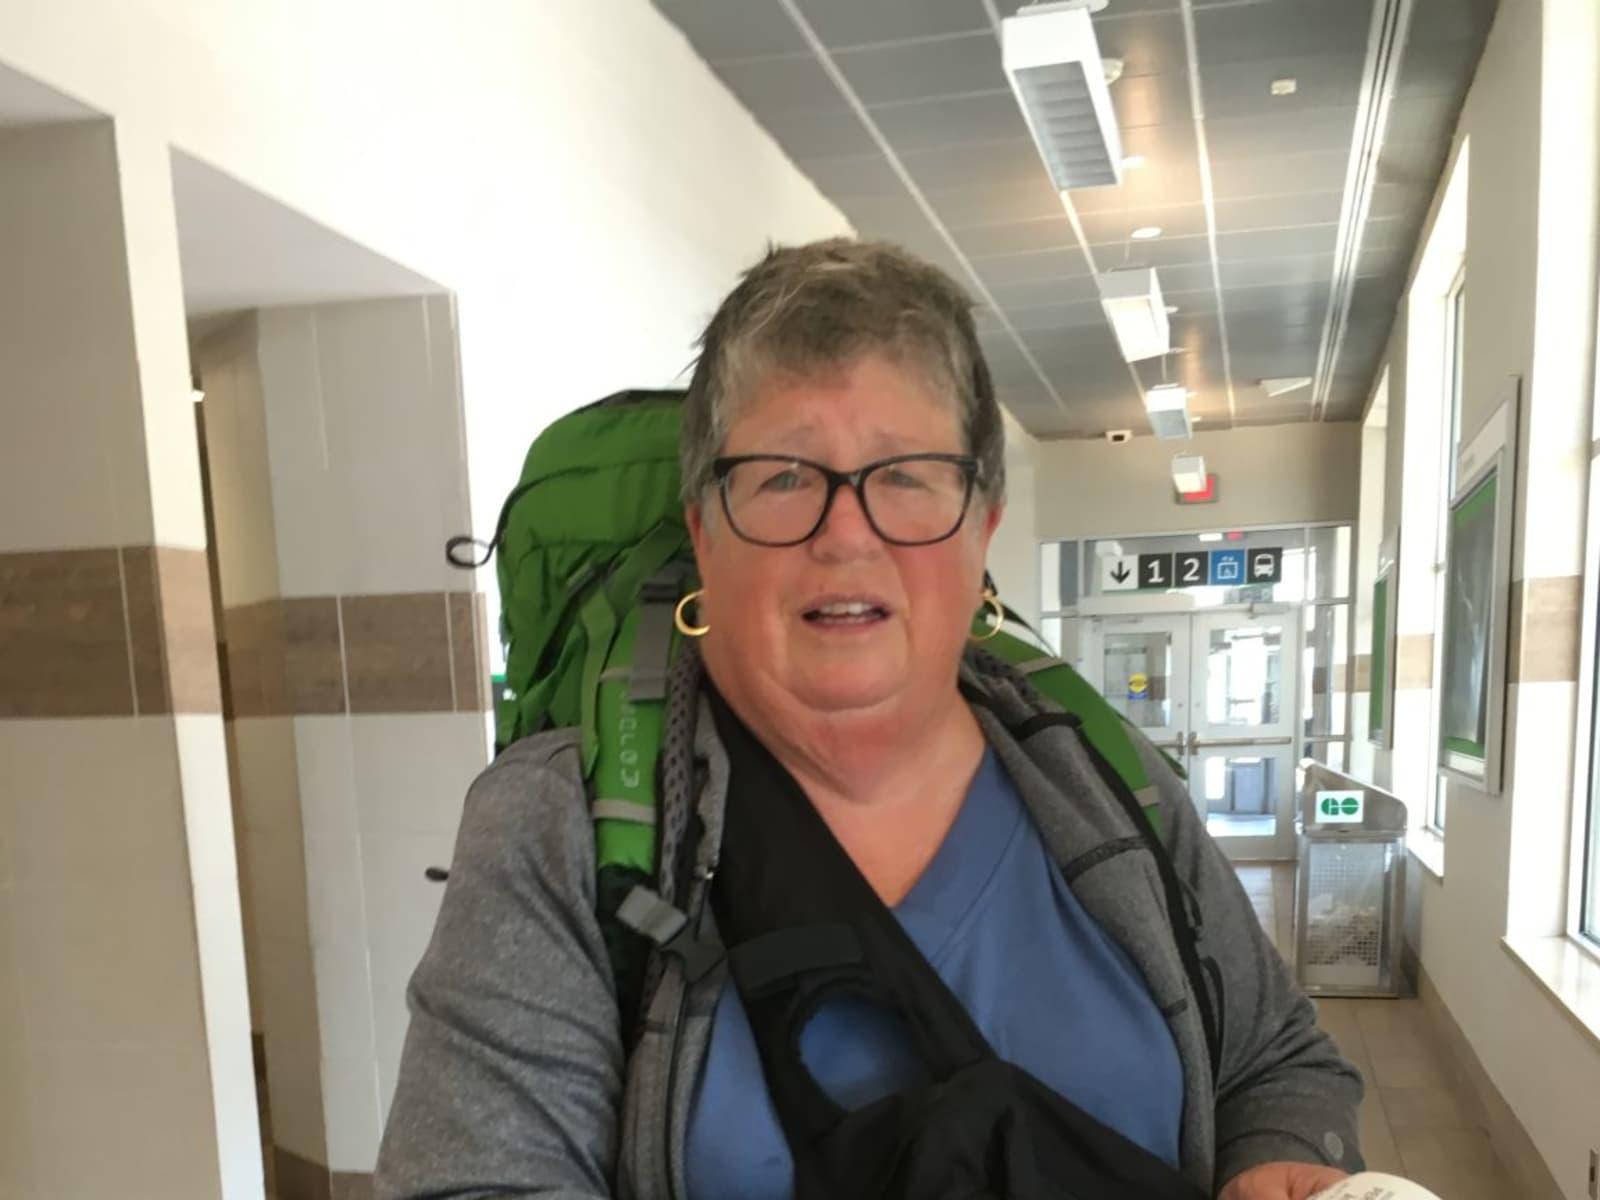 Geraldine from Sherbrooke, Quebec, Canada